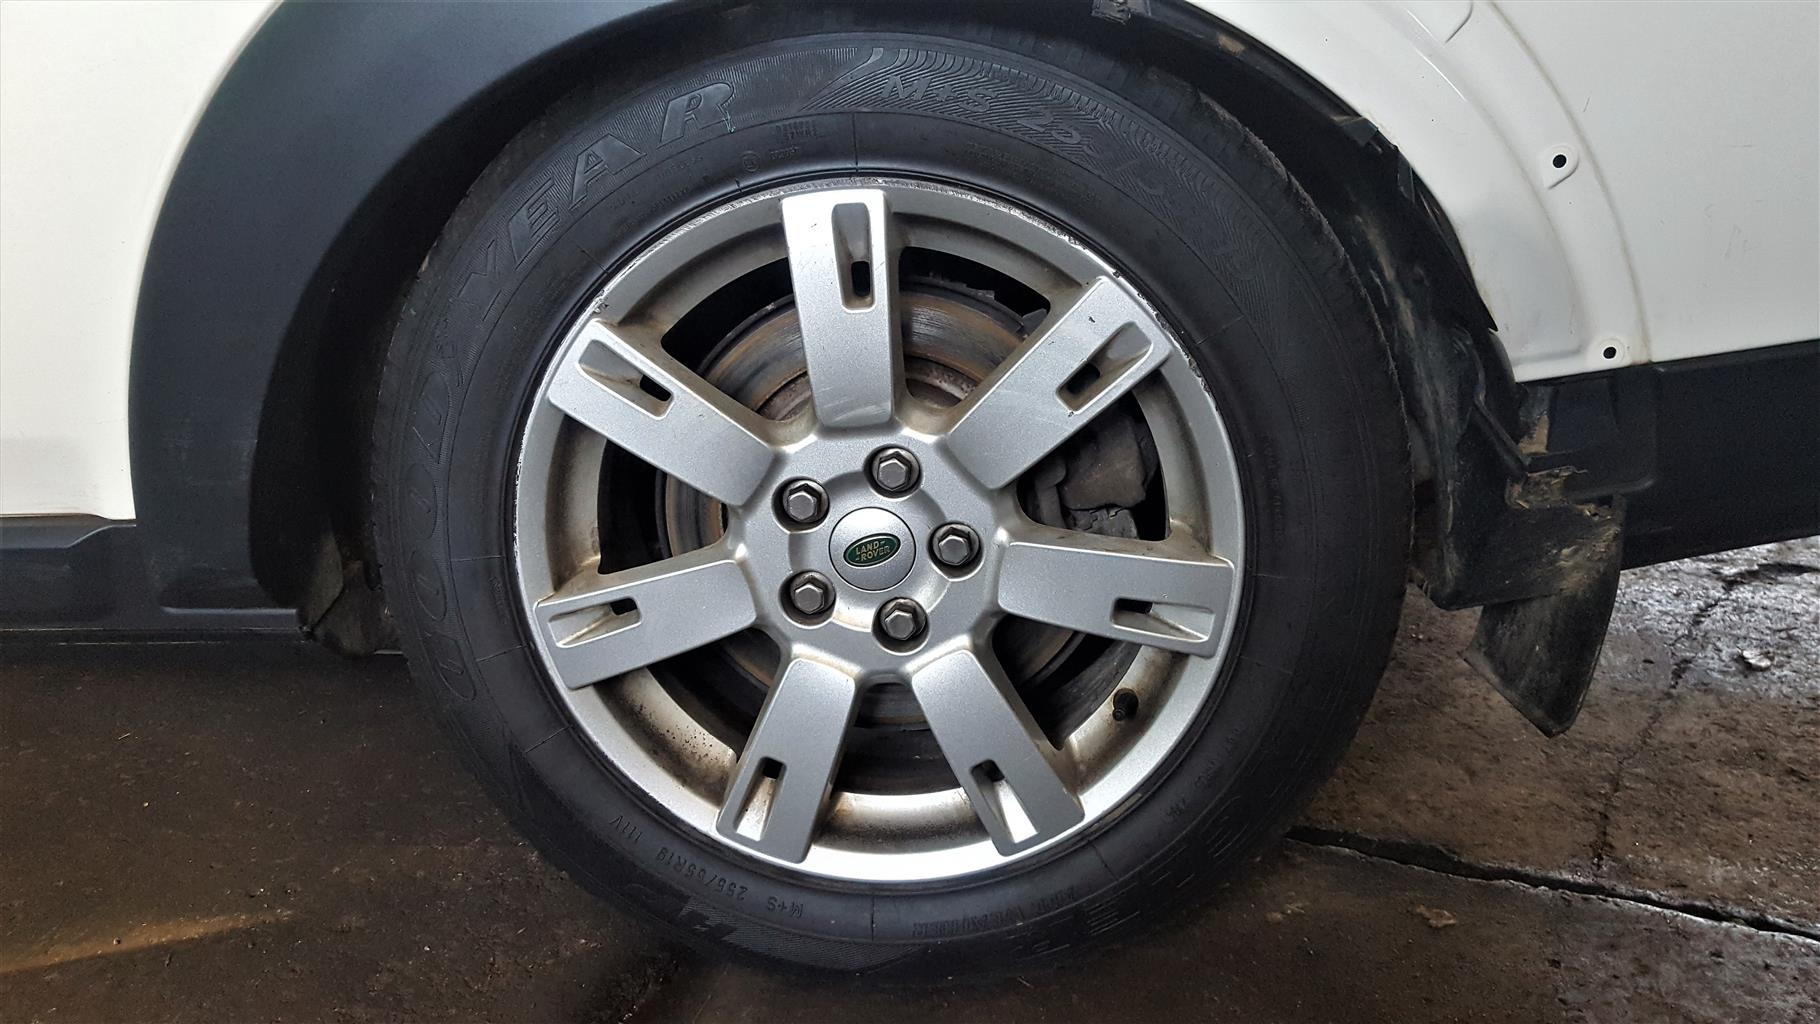 Land Rover Discovery 4 Rims for sale | AUTO EZI